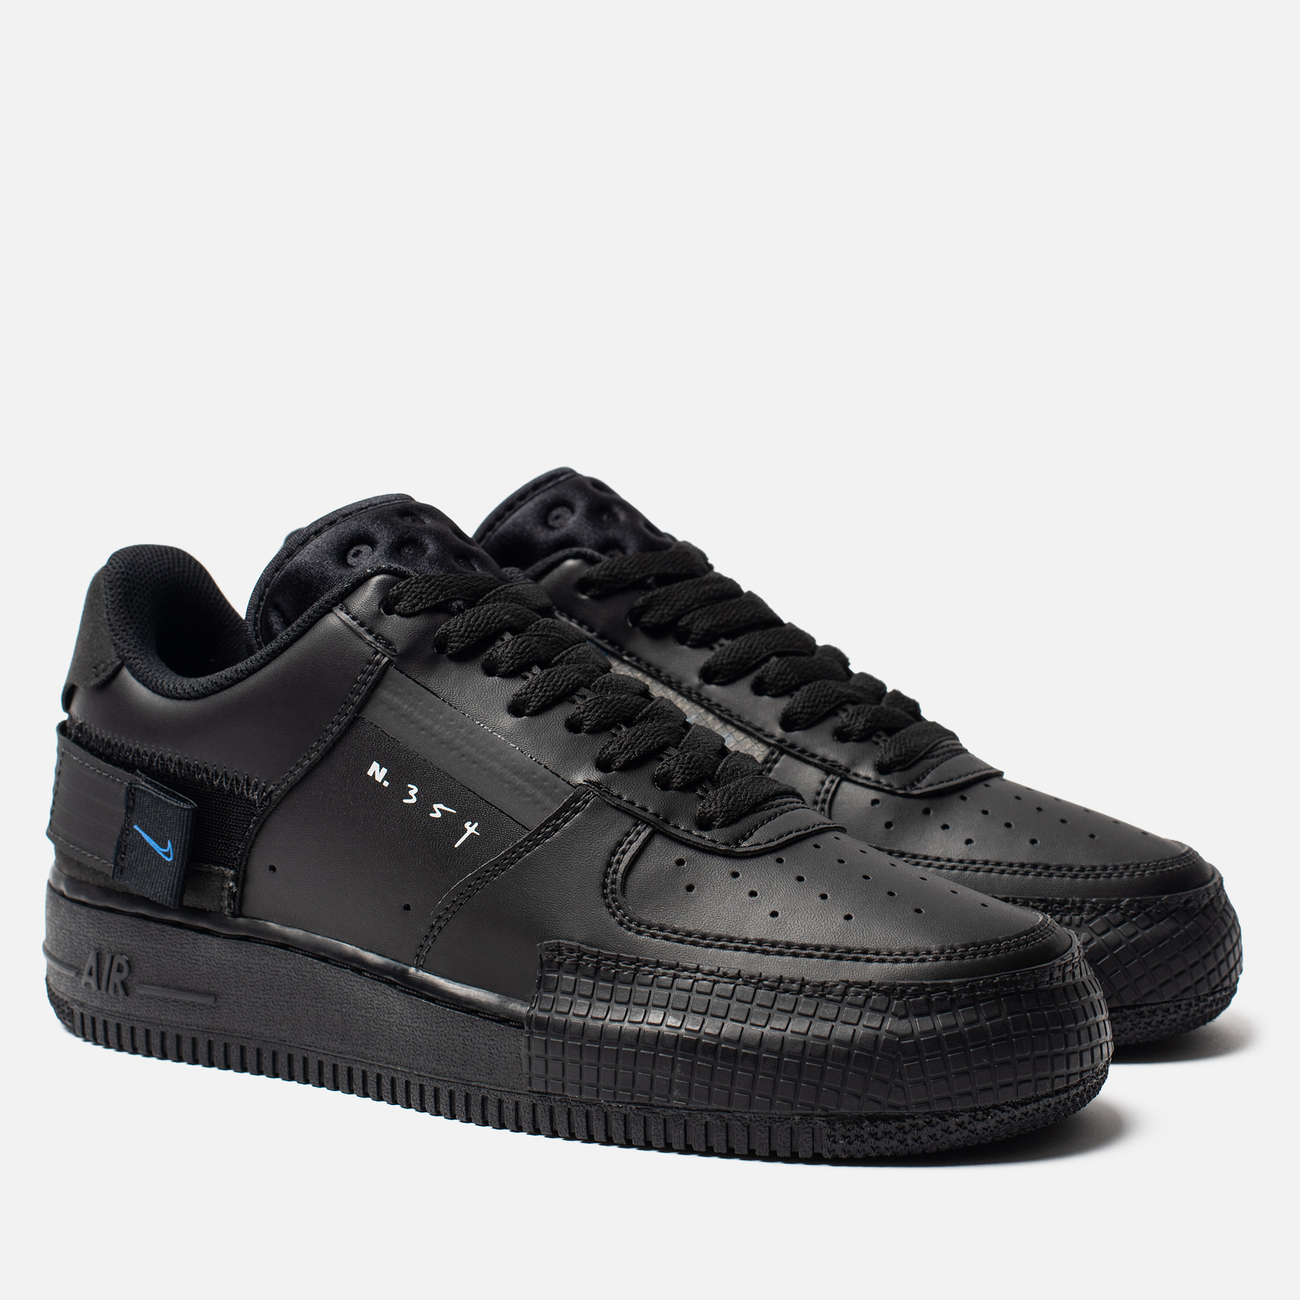 Кроссовки Nike Air Force 1 Type Black/Photo Blue/Platinum Tint